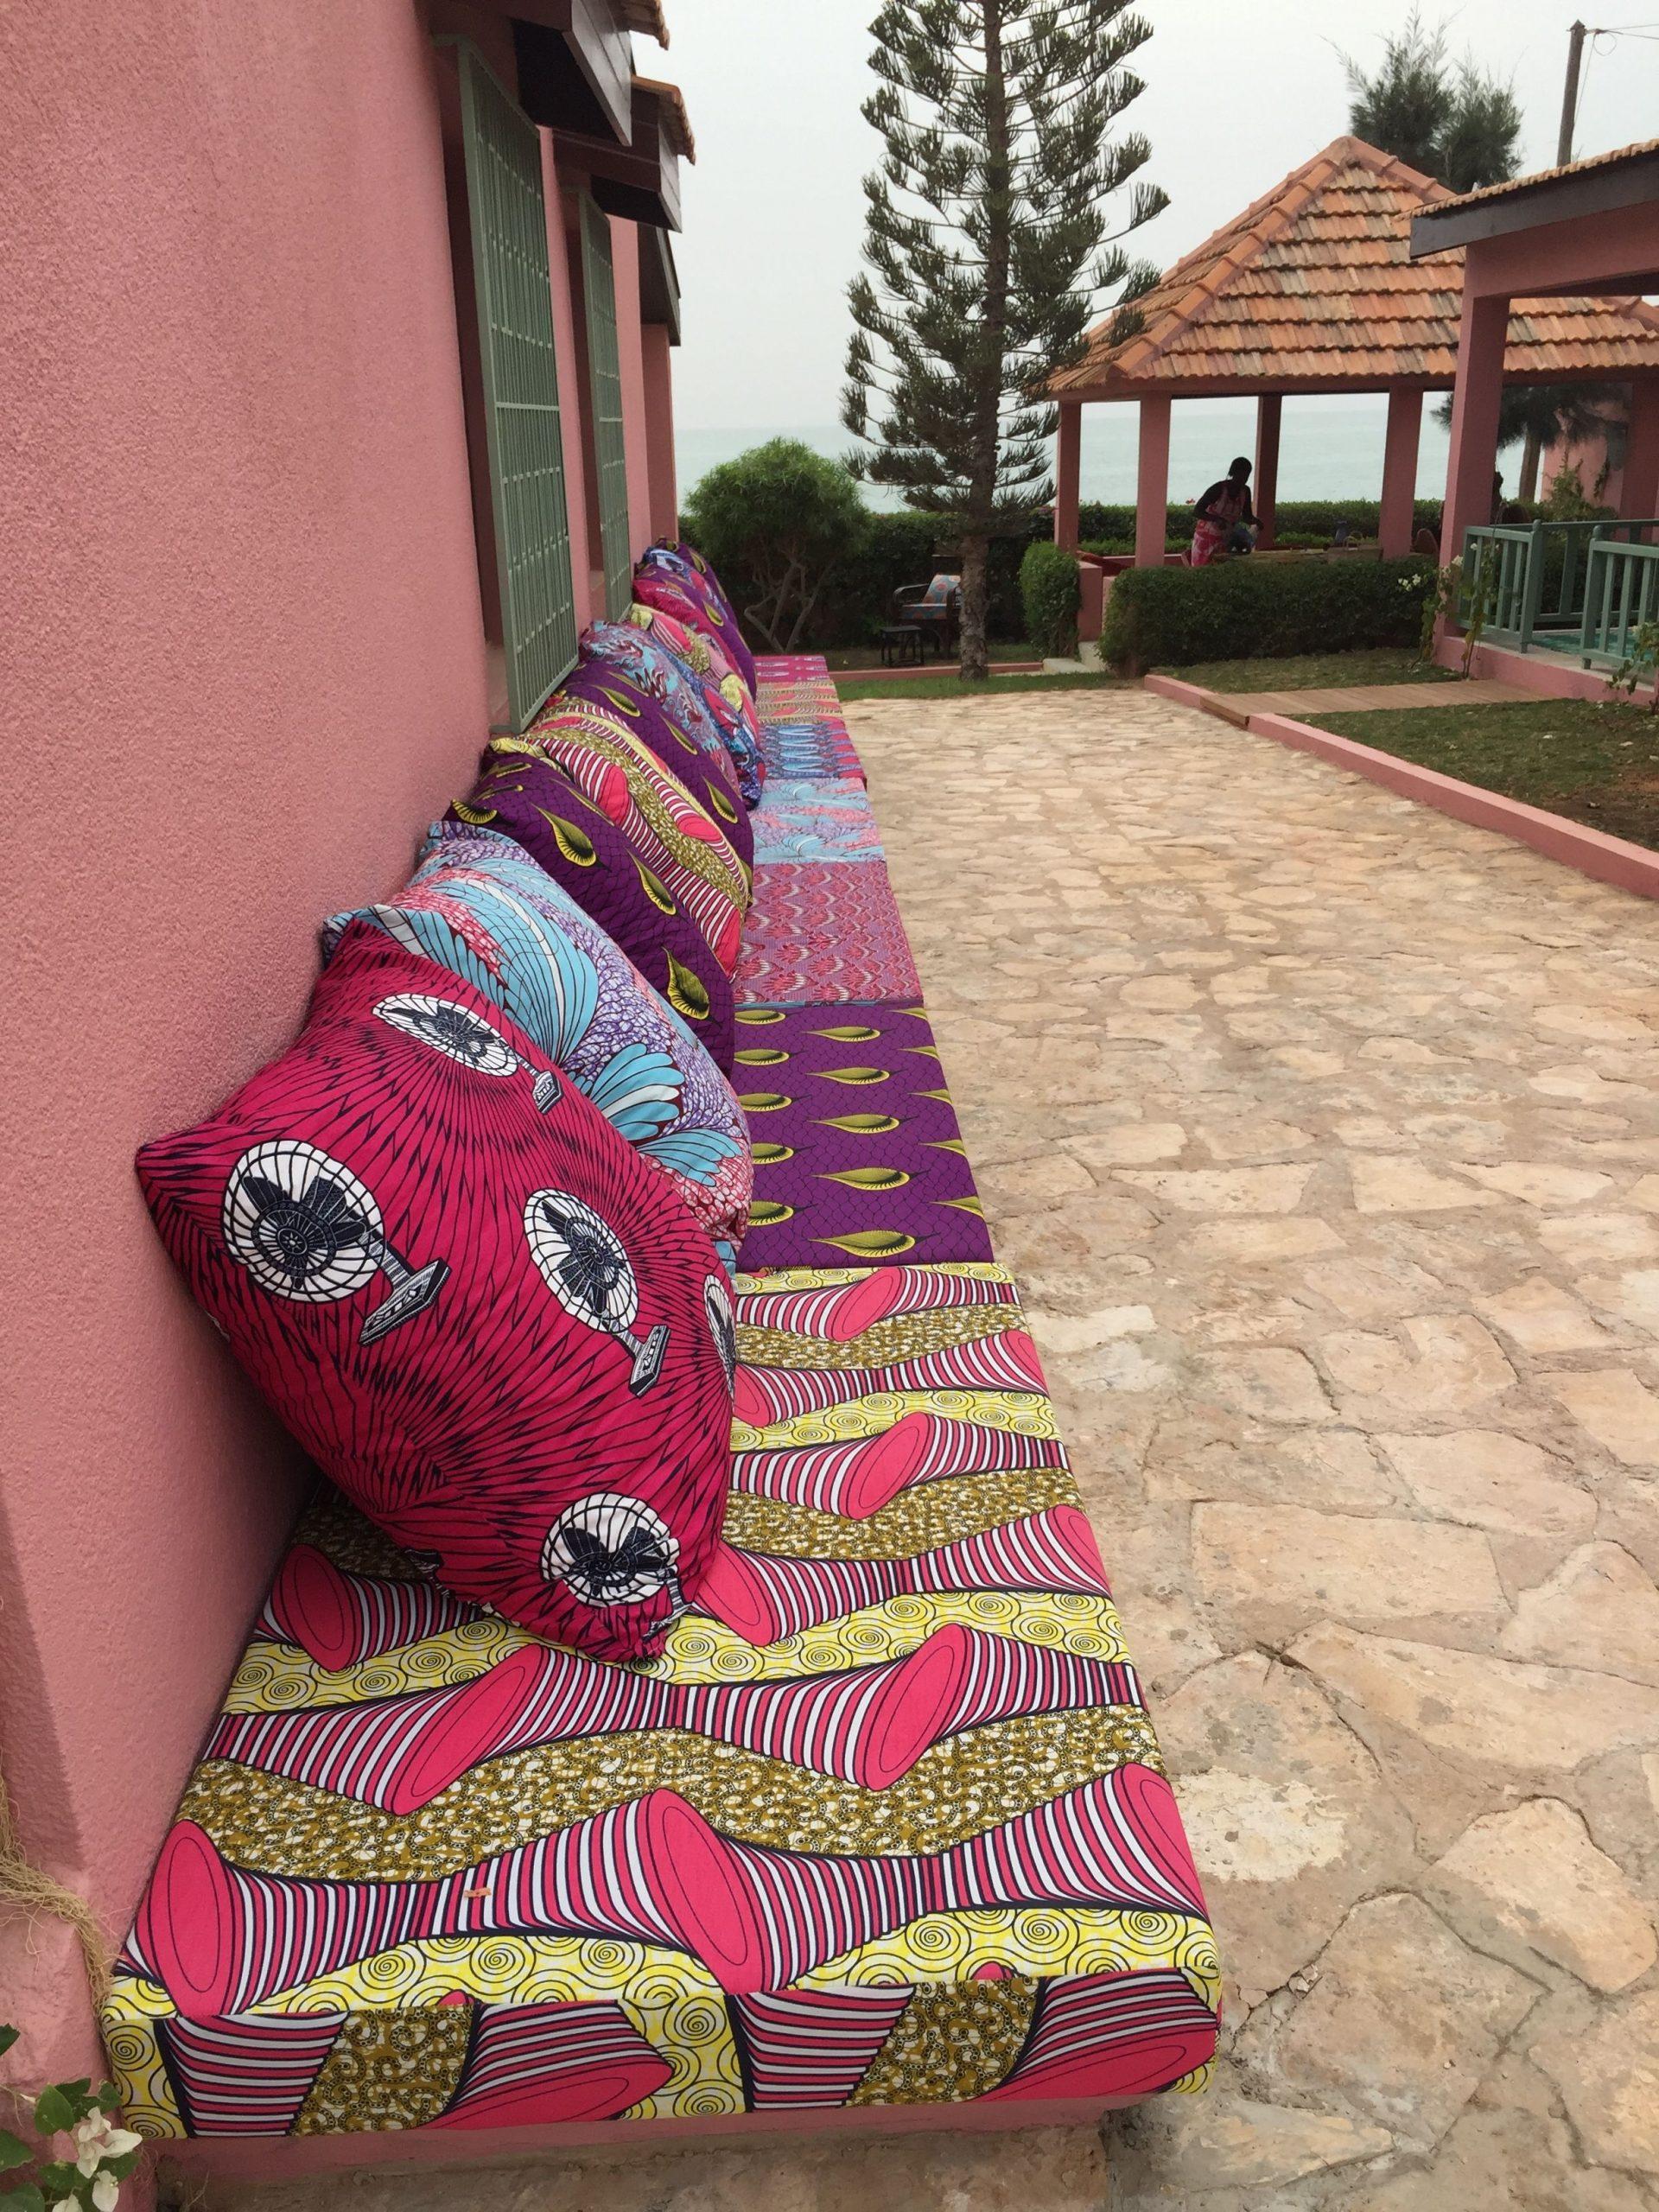 African Inspired Interior Design Ideas | Design D'intérieur ... concernant Tissu Pour Salon De Jardin